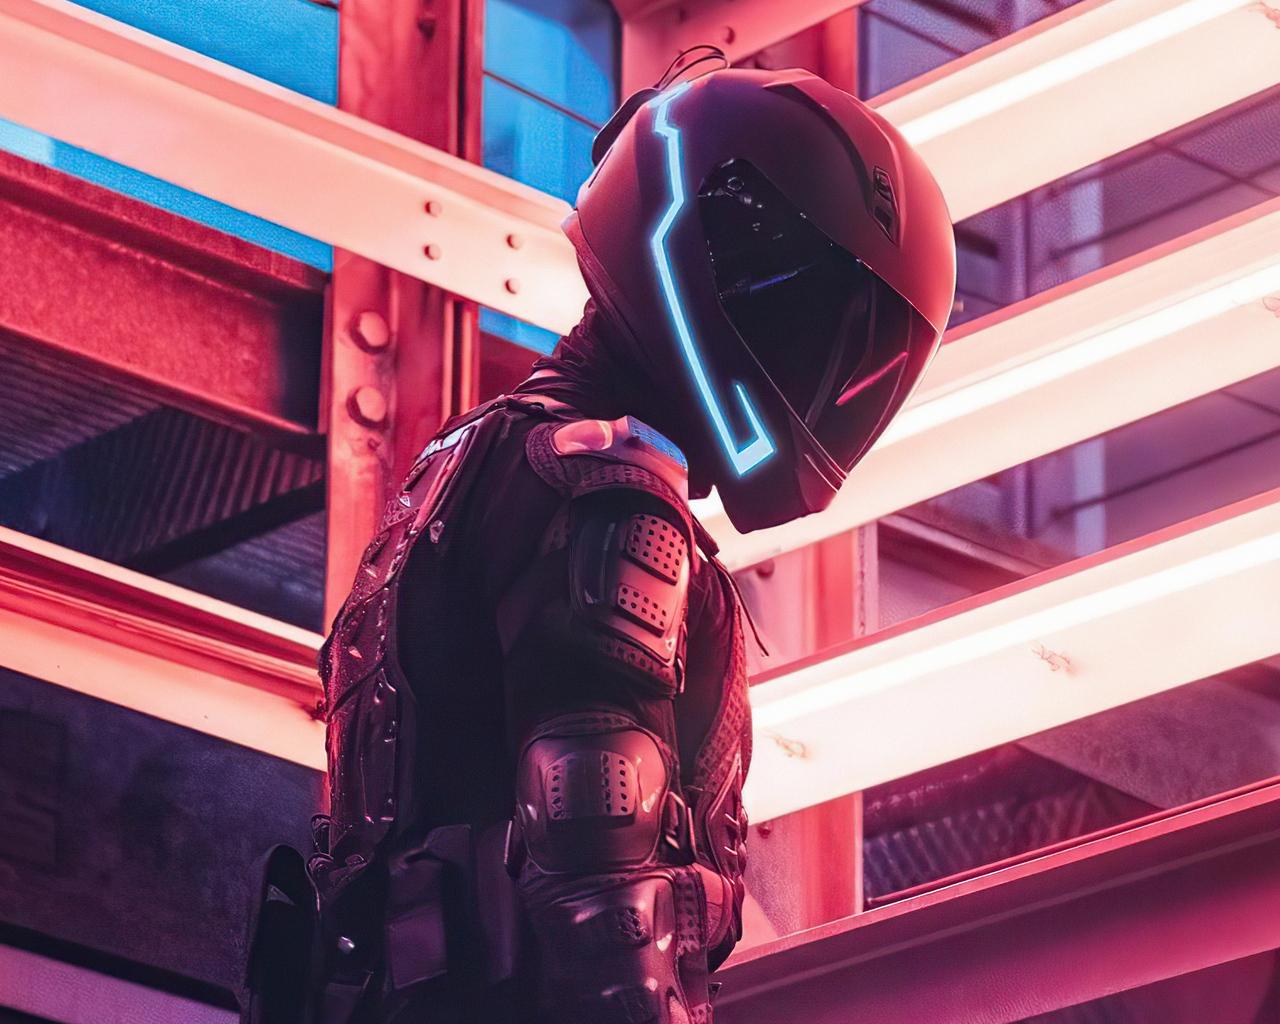 tech-noir-helmet-scifi-5k-n4.jpg